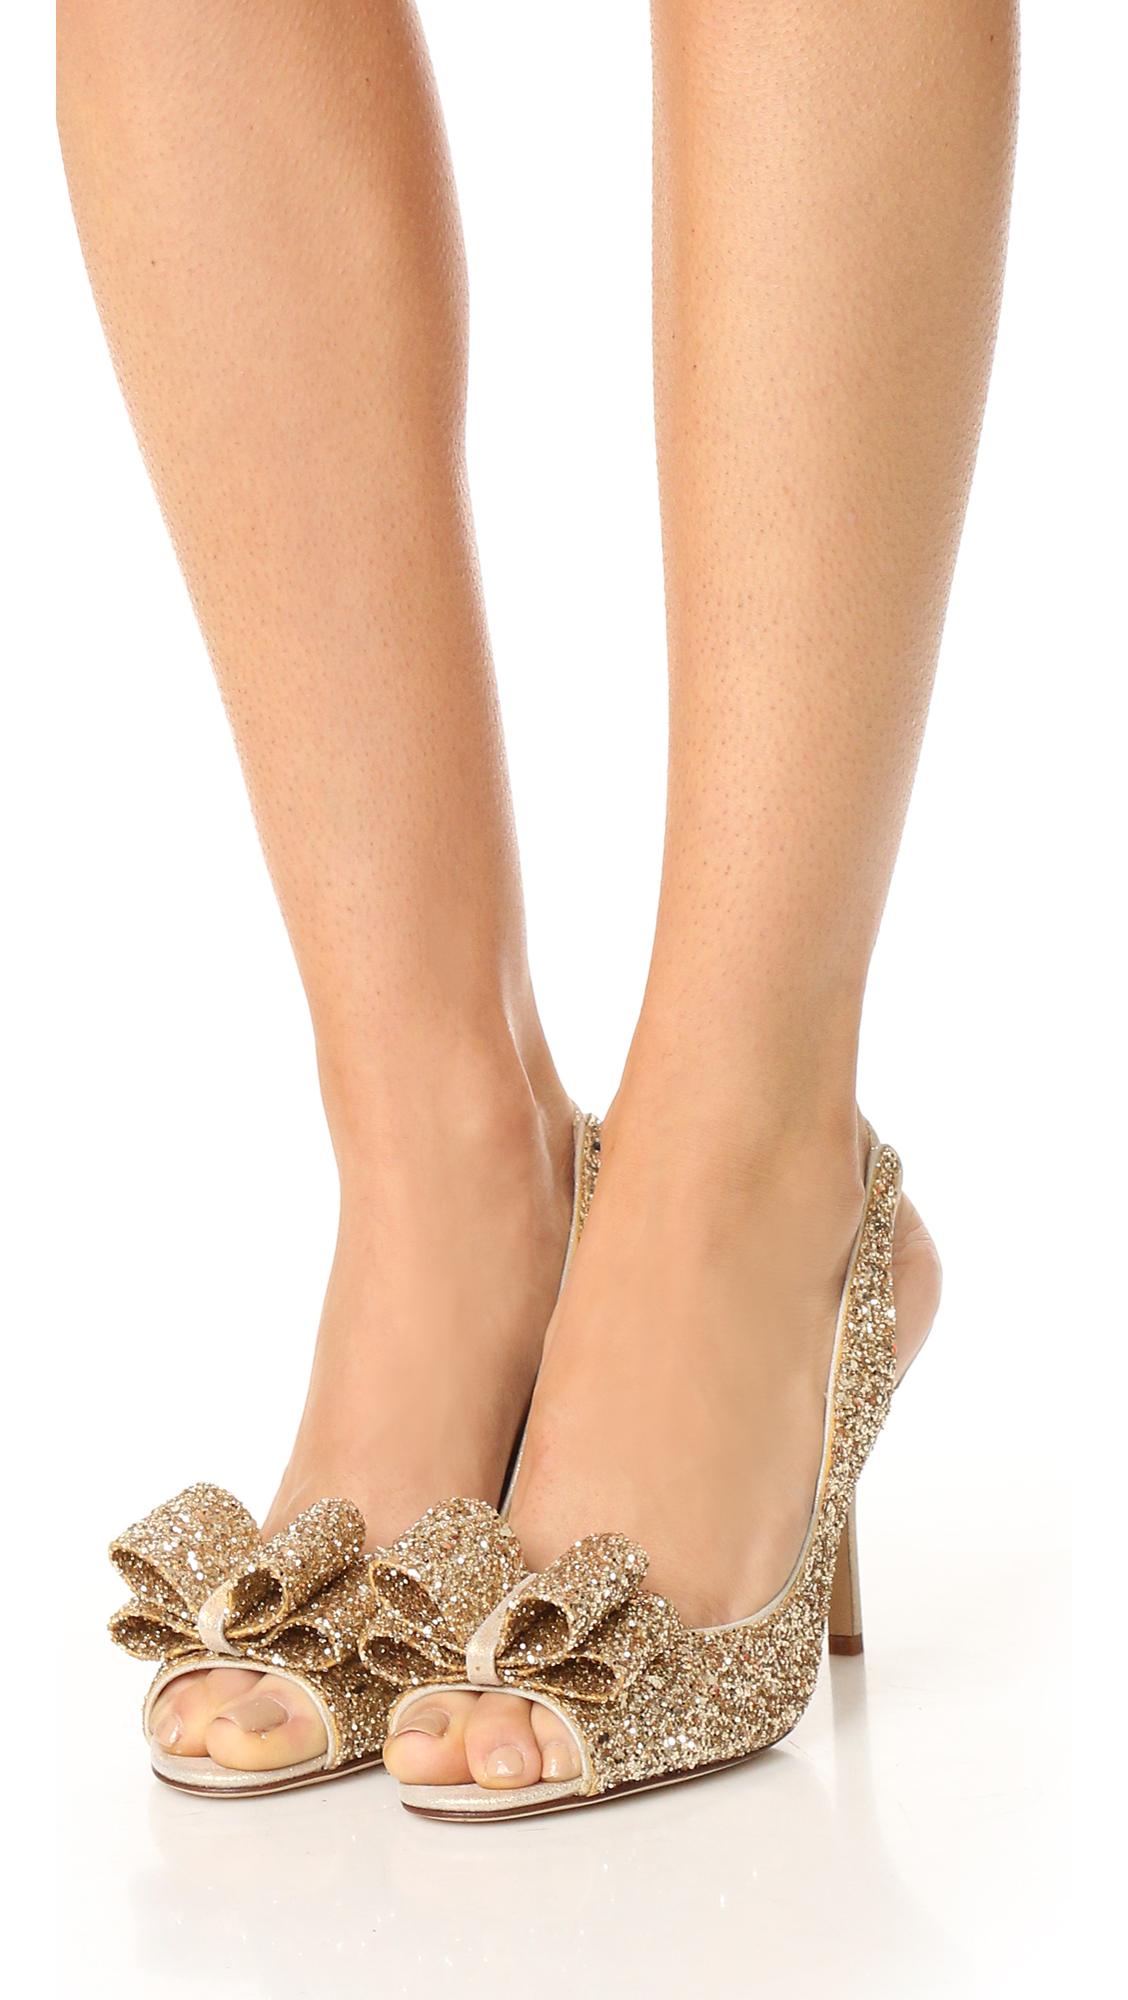 Kate Spade New York Charm Glitter Pumps new arrival online discount big sale outlet visit new 8iVFl5EDJ